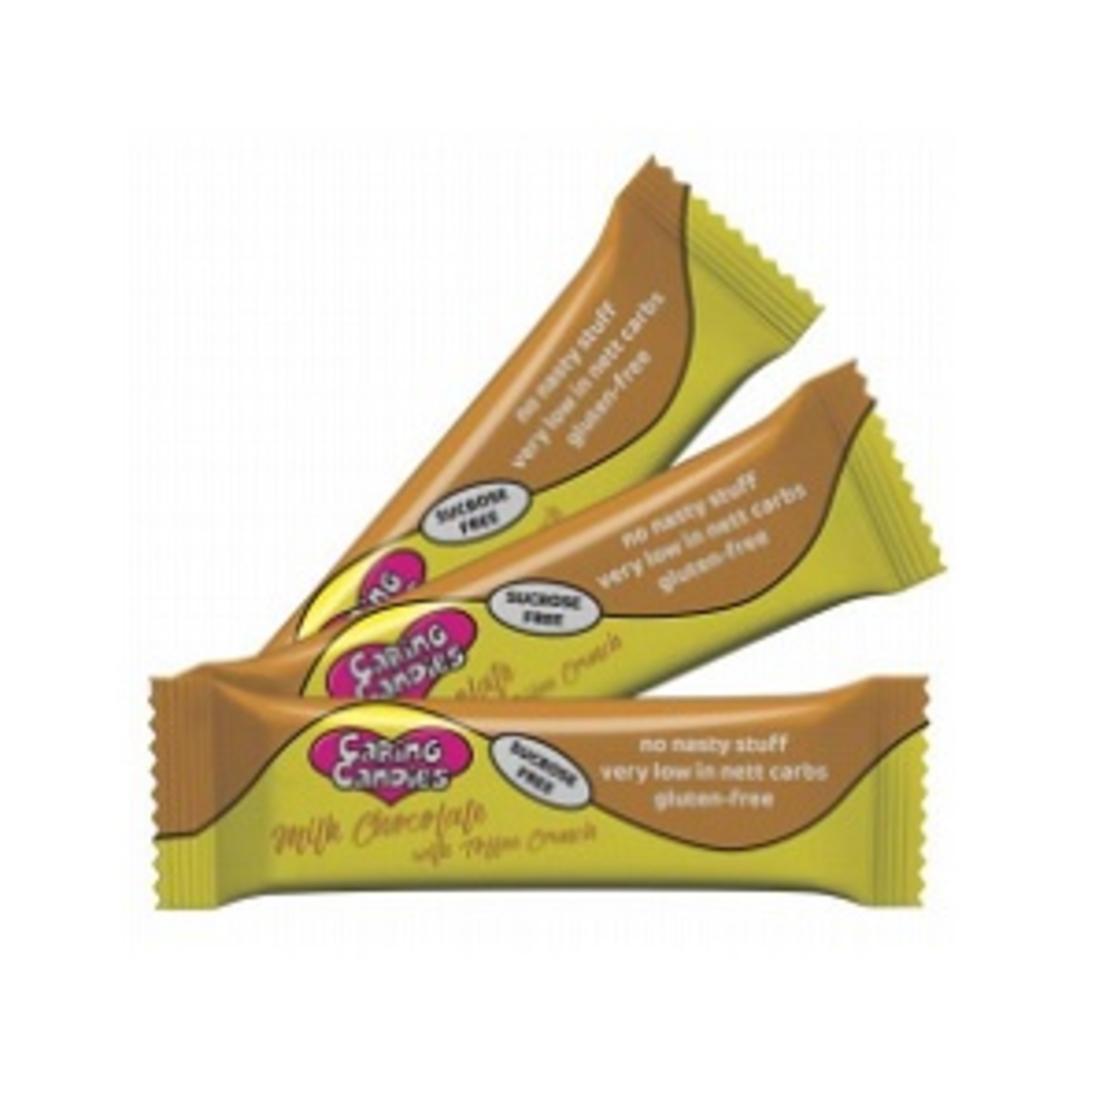 Sugar Free 30% Milk Chocolate with Toffee Crunch 50g